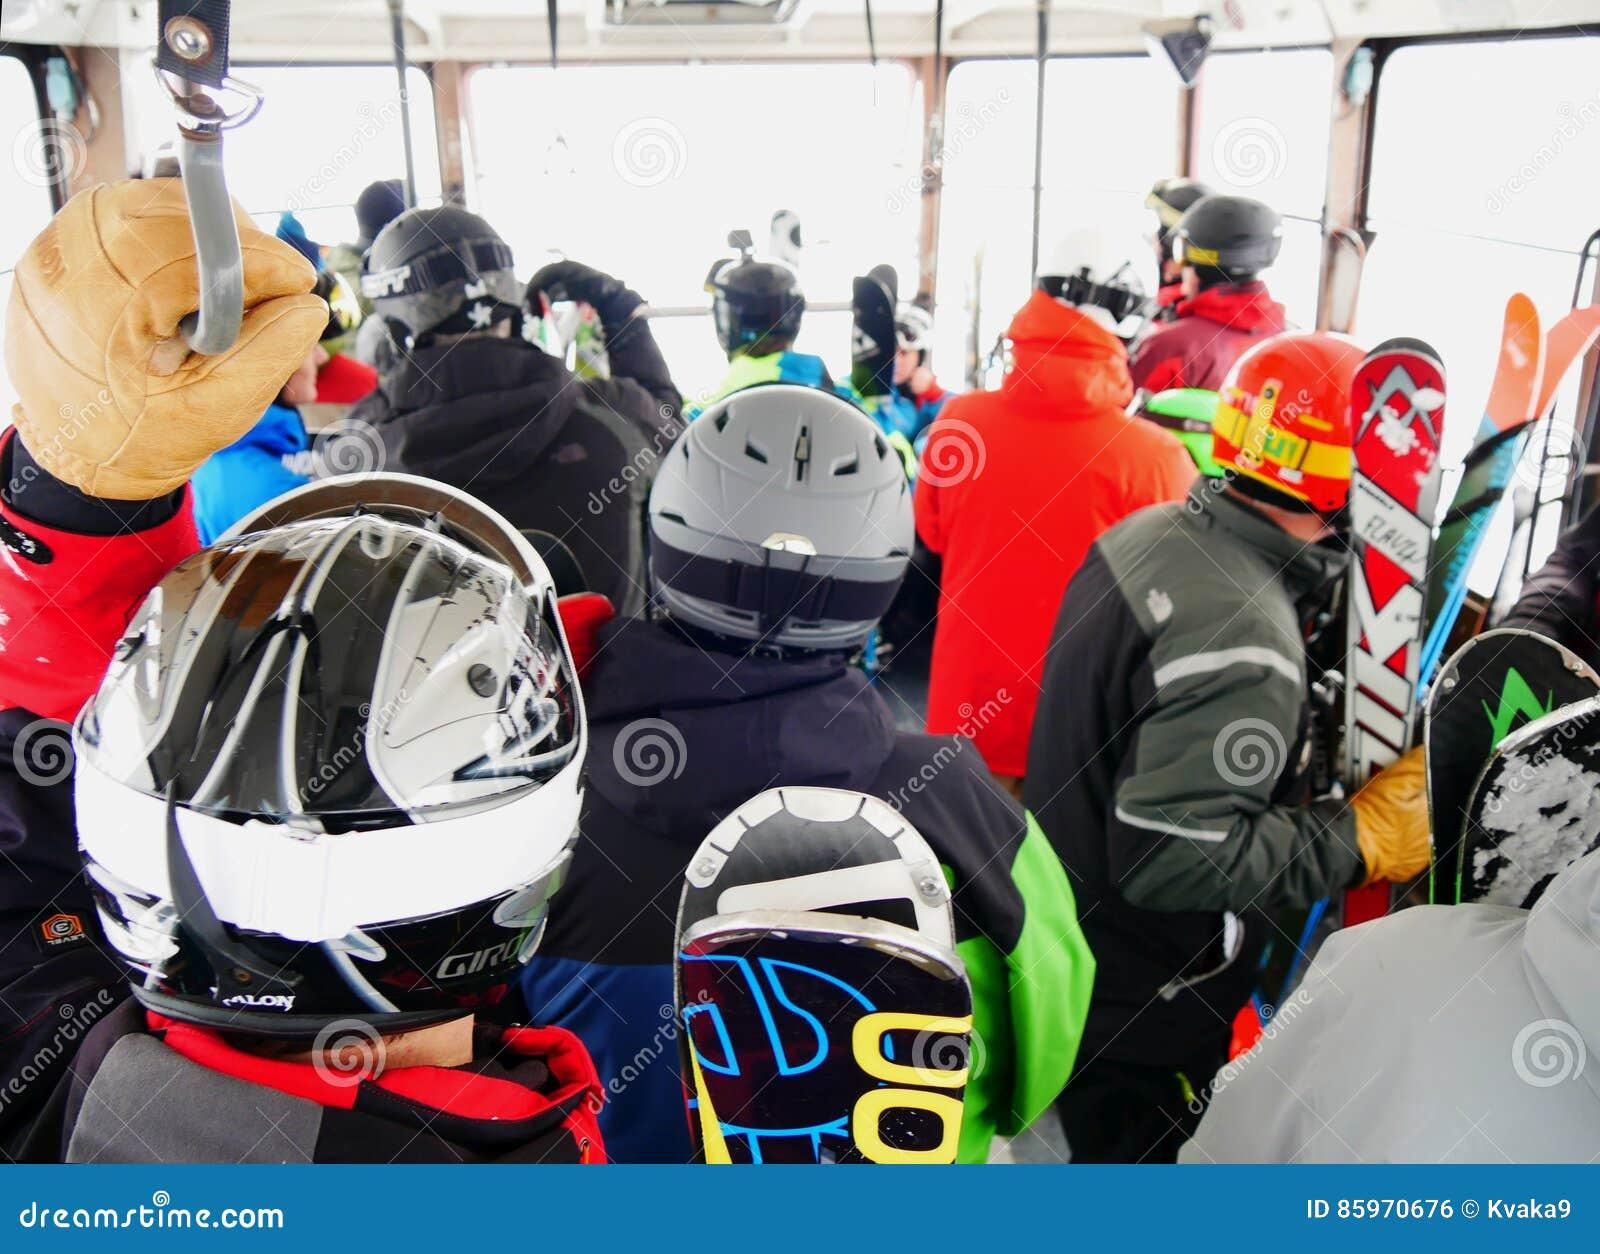 Crowded inside the ski gondola